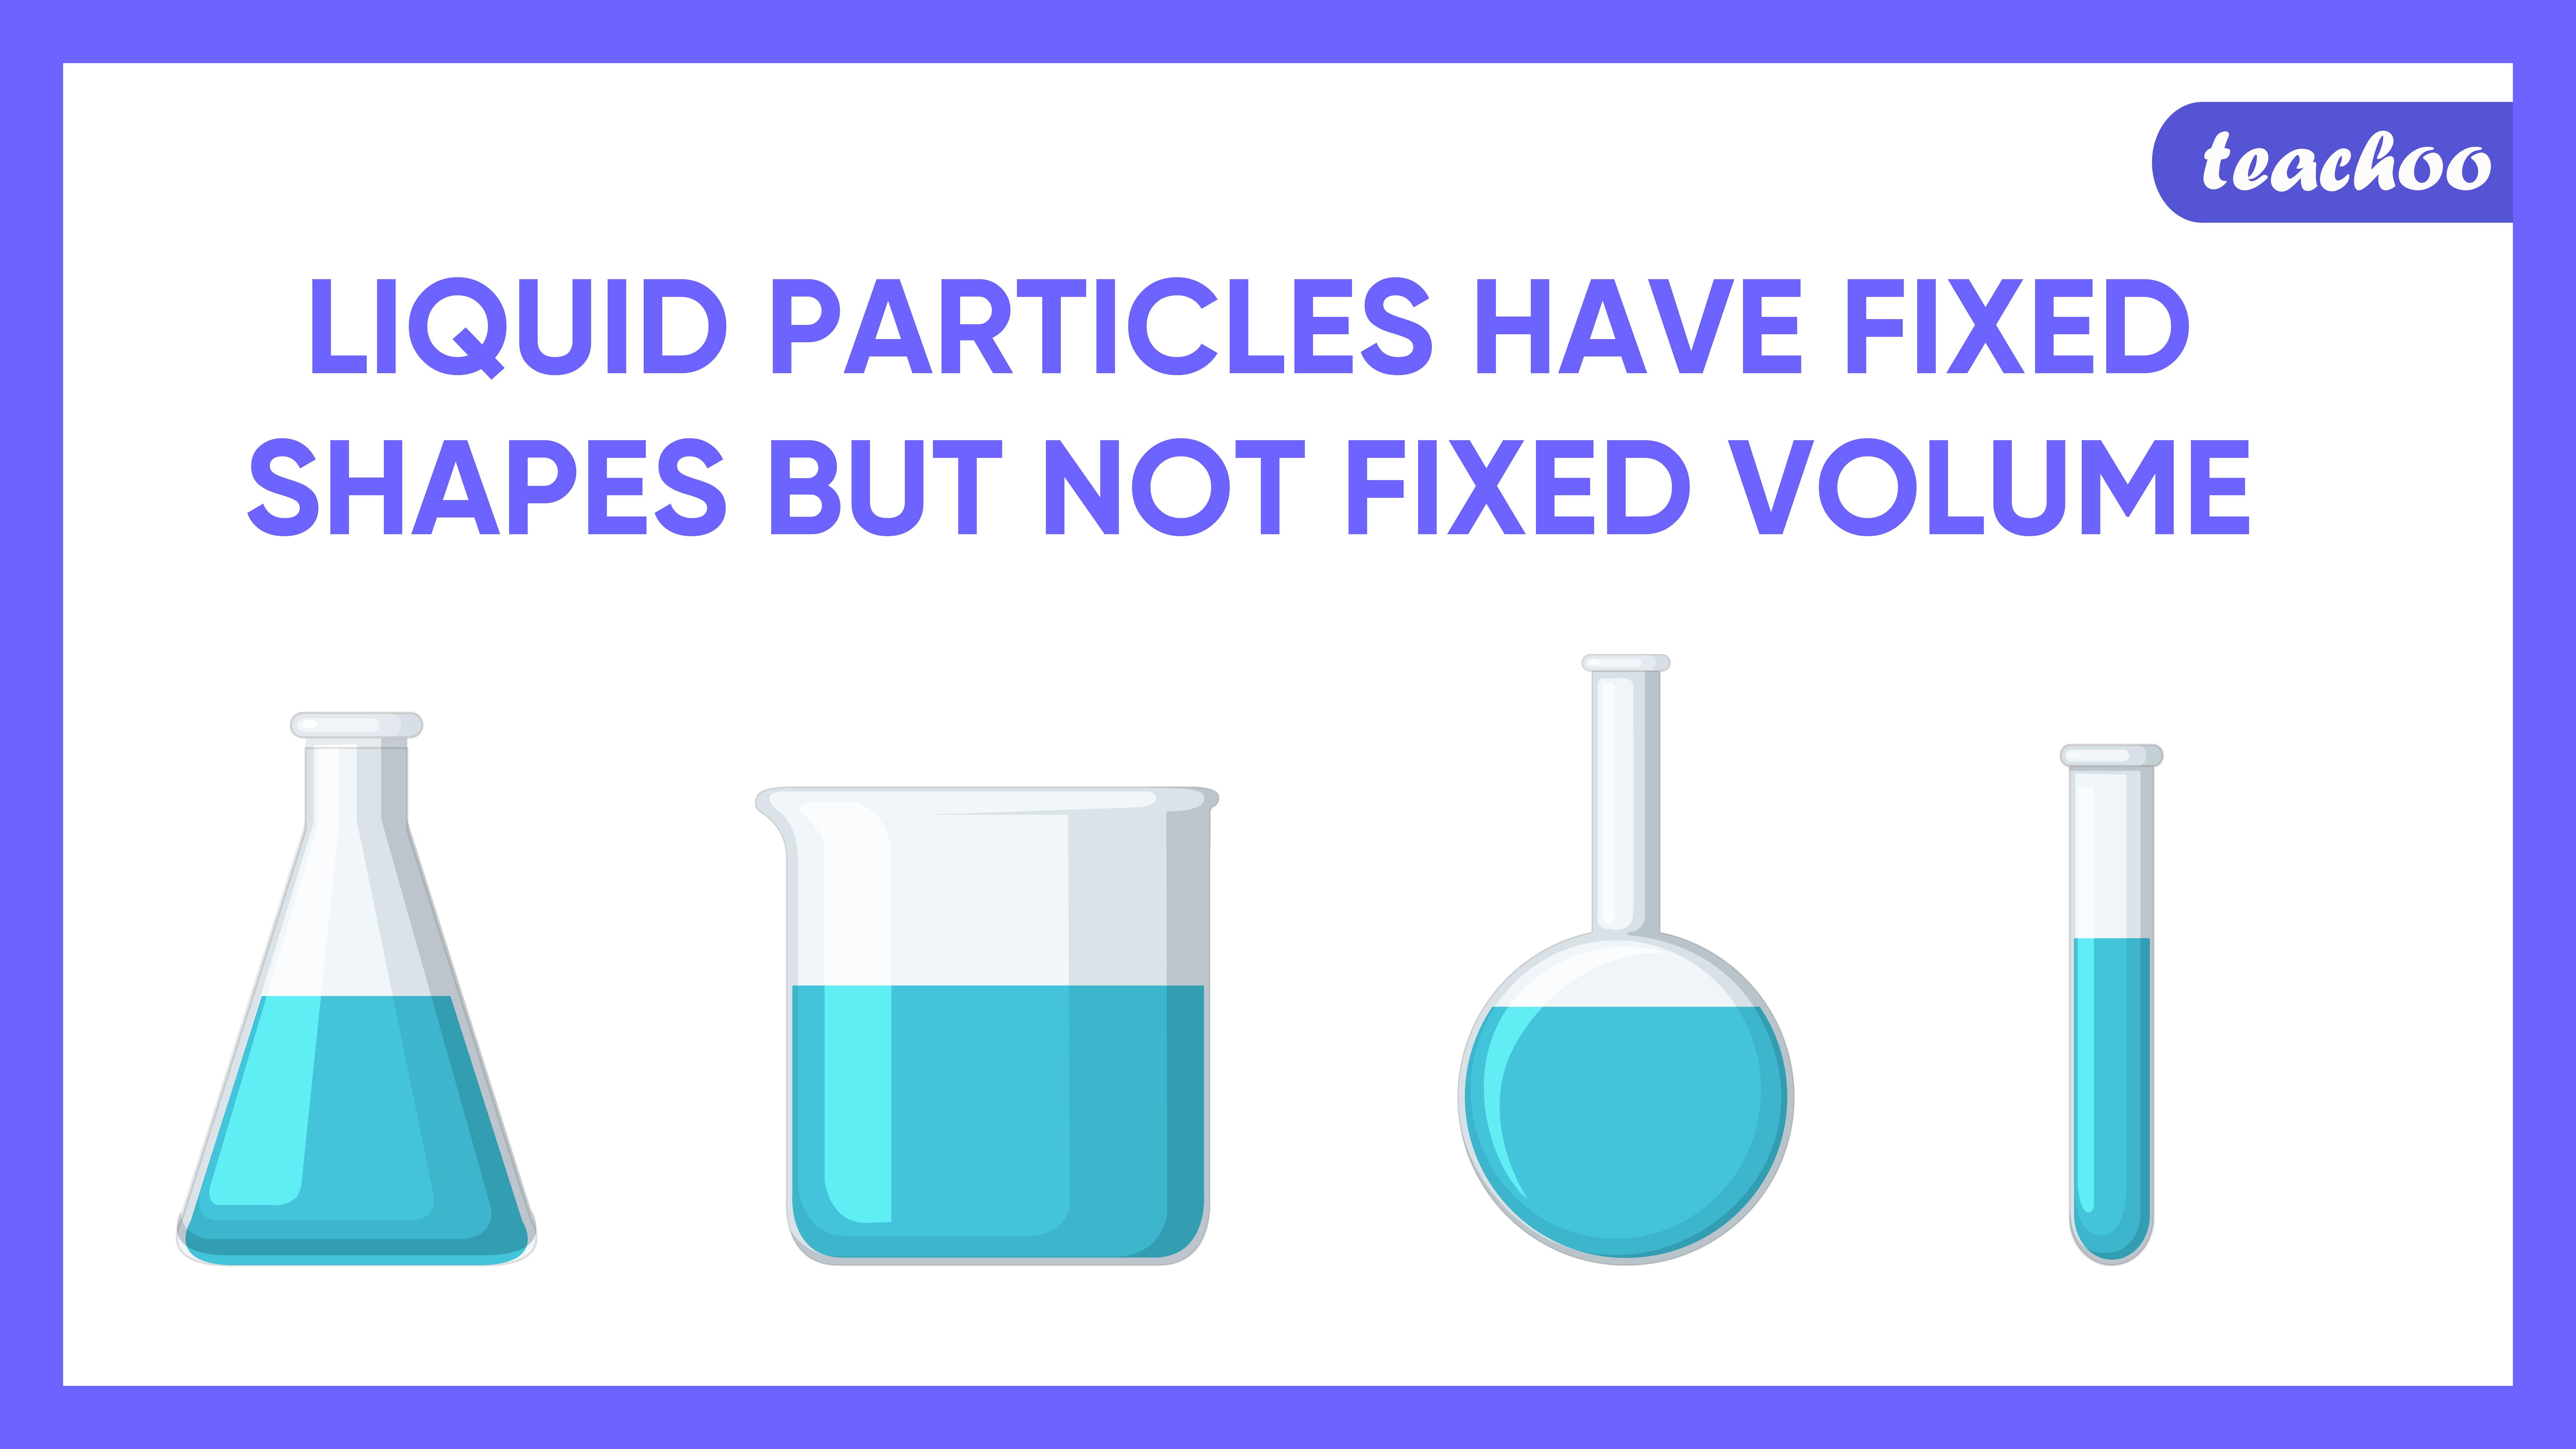 Liquid particles have fixed shapes but not fixed volume-Teachoo-01.jpg